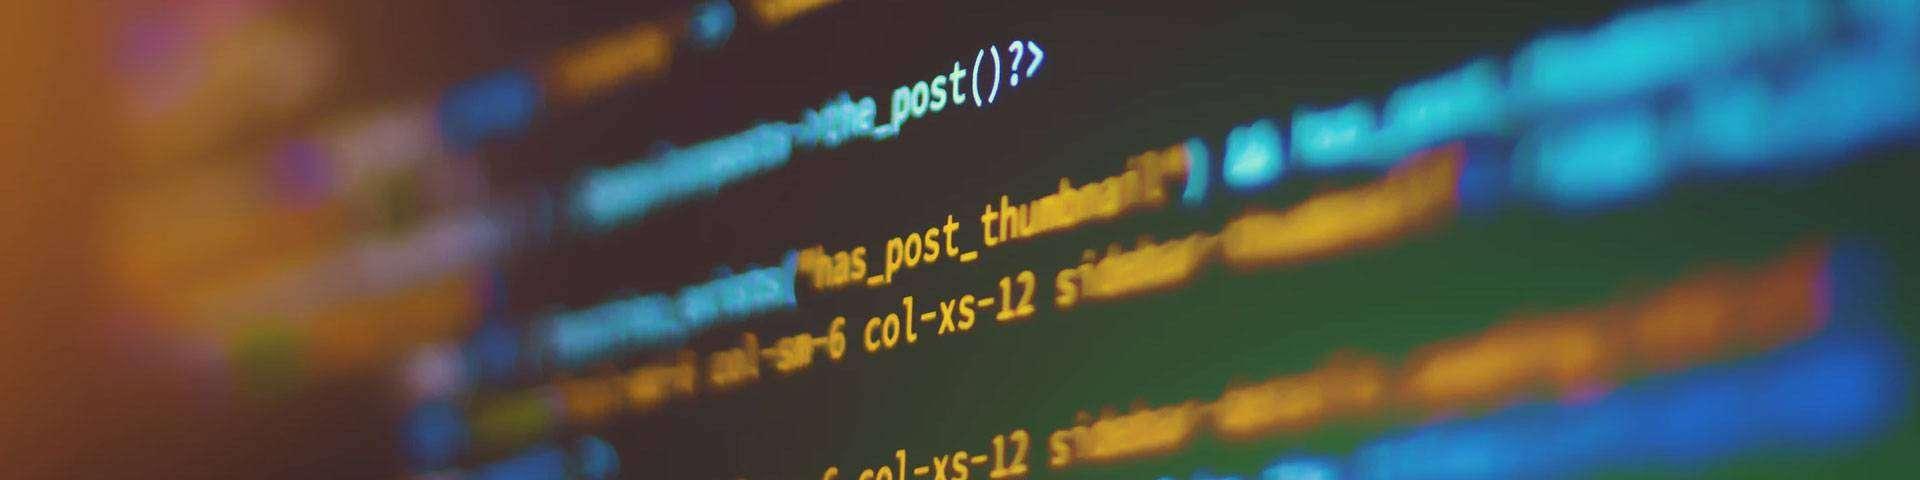 web-development surrey